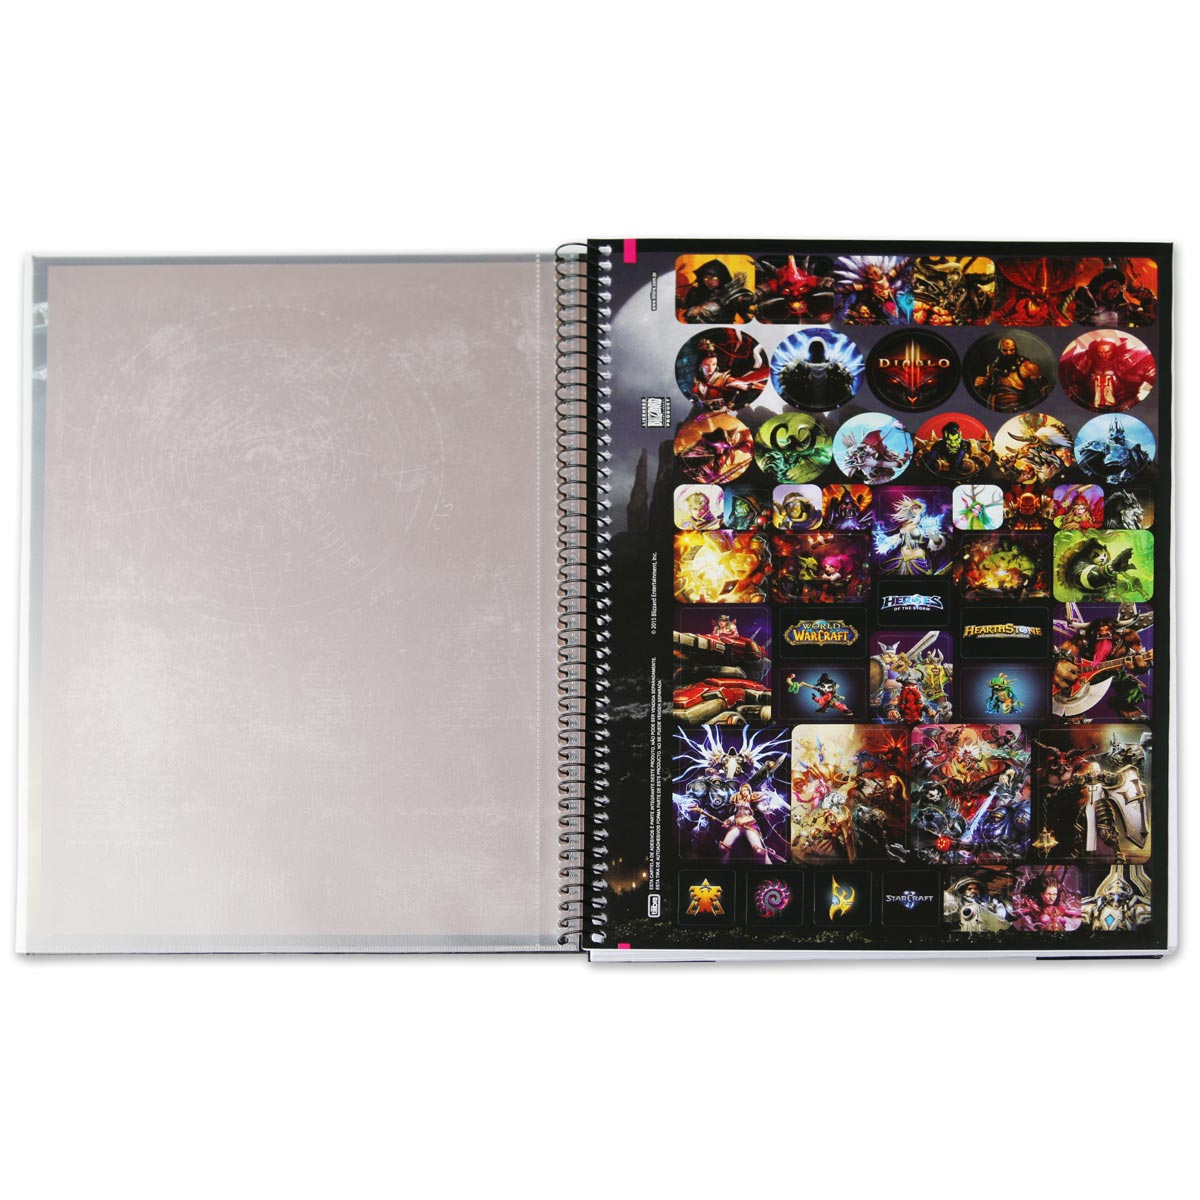 Caderno World of Warcraft Sylvanas 1 Matéria